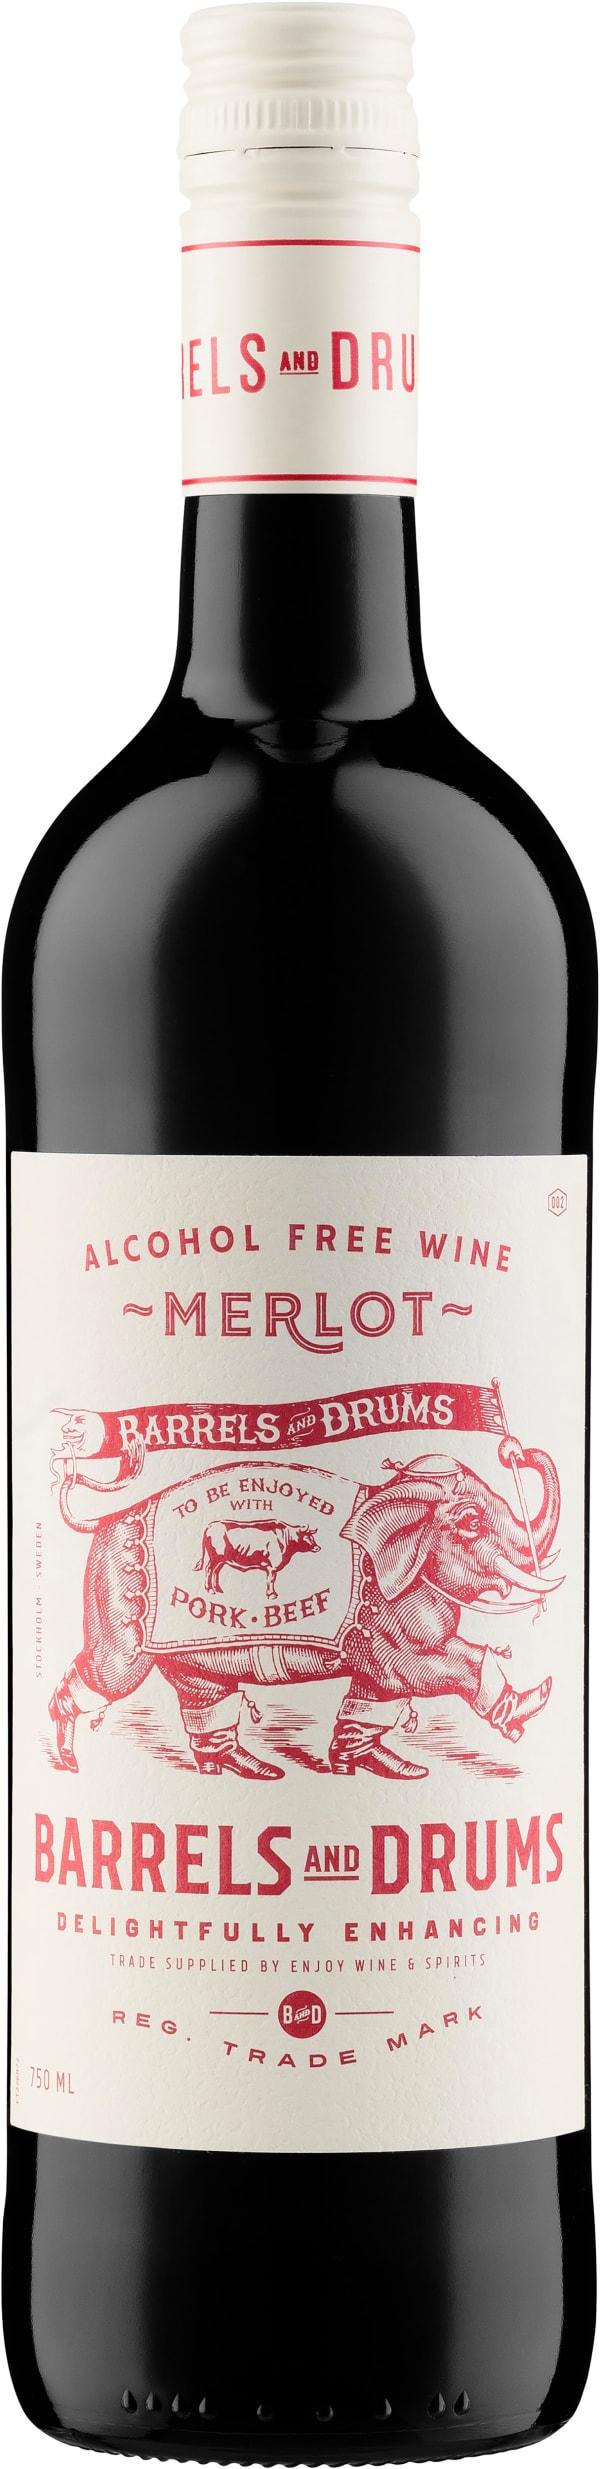 Barrels and Drums Merlot Alcohol Free